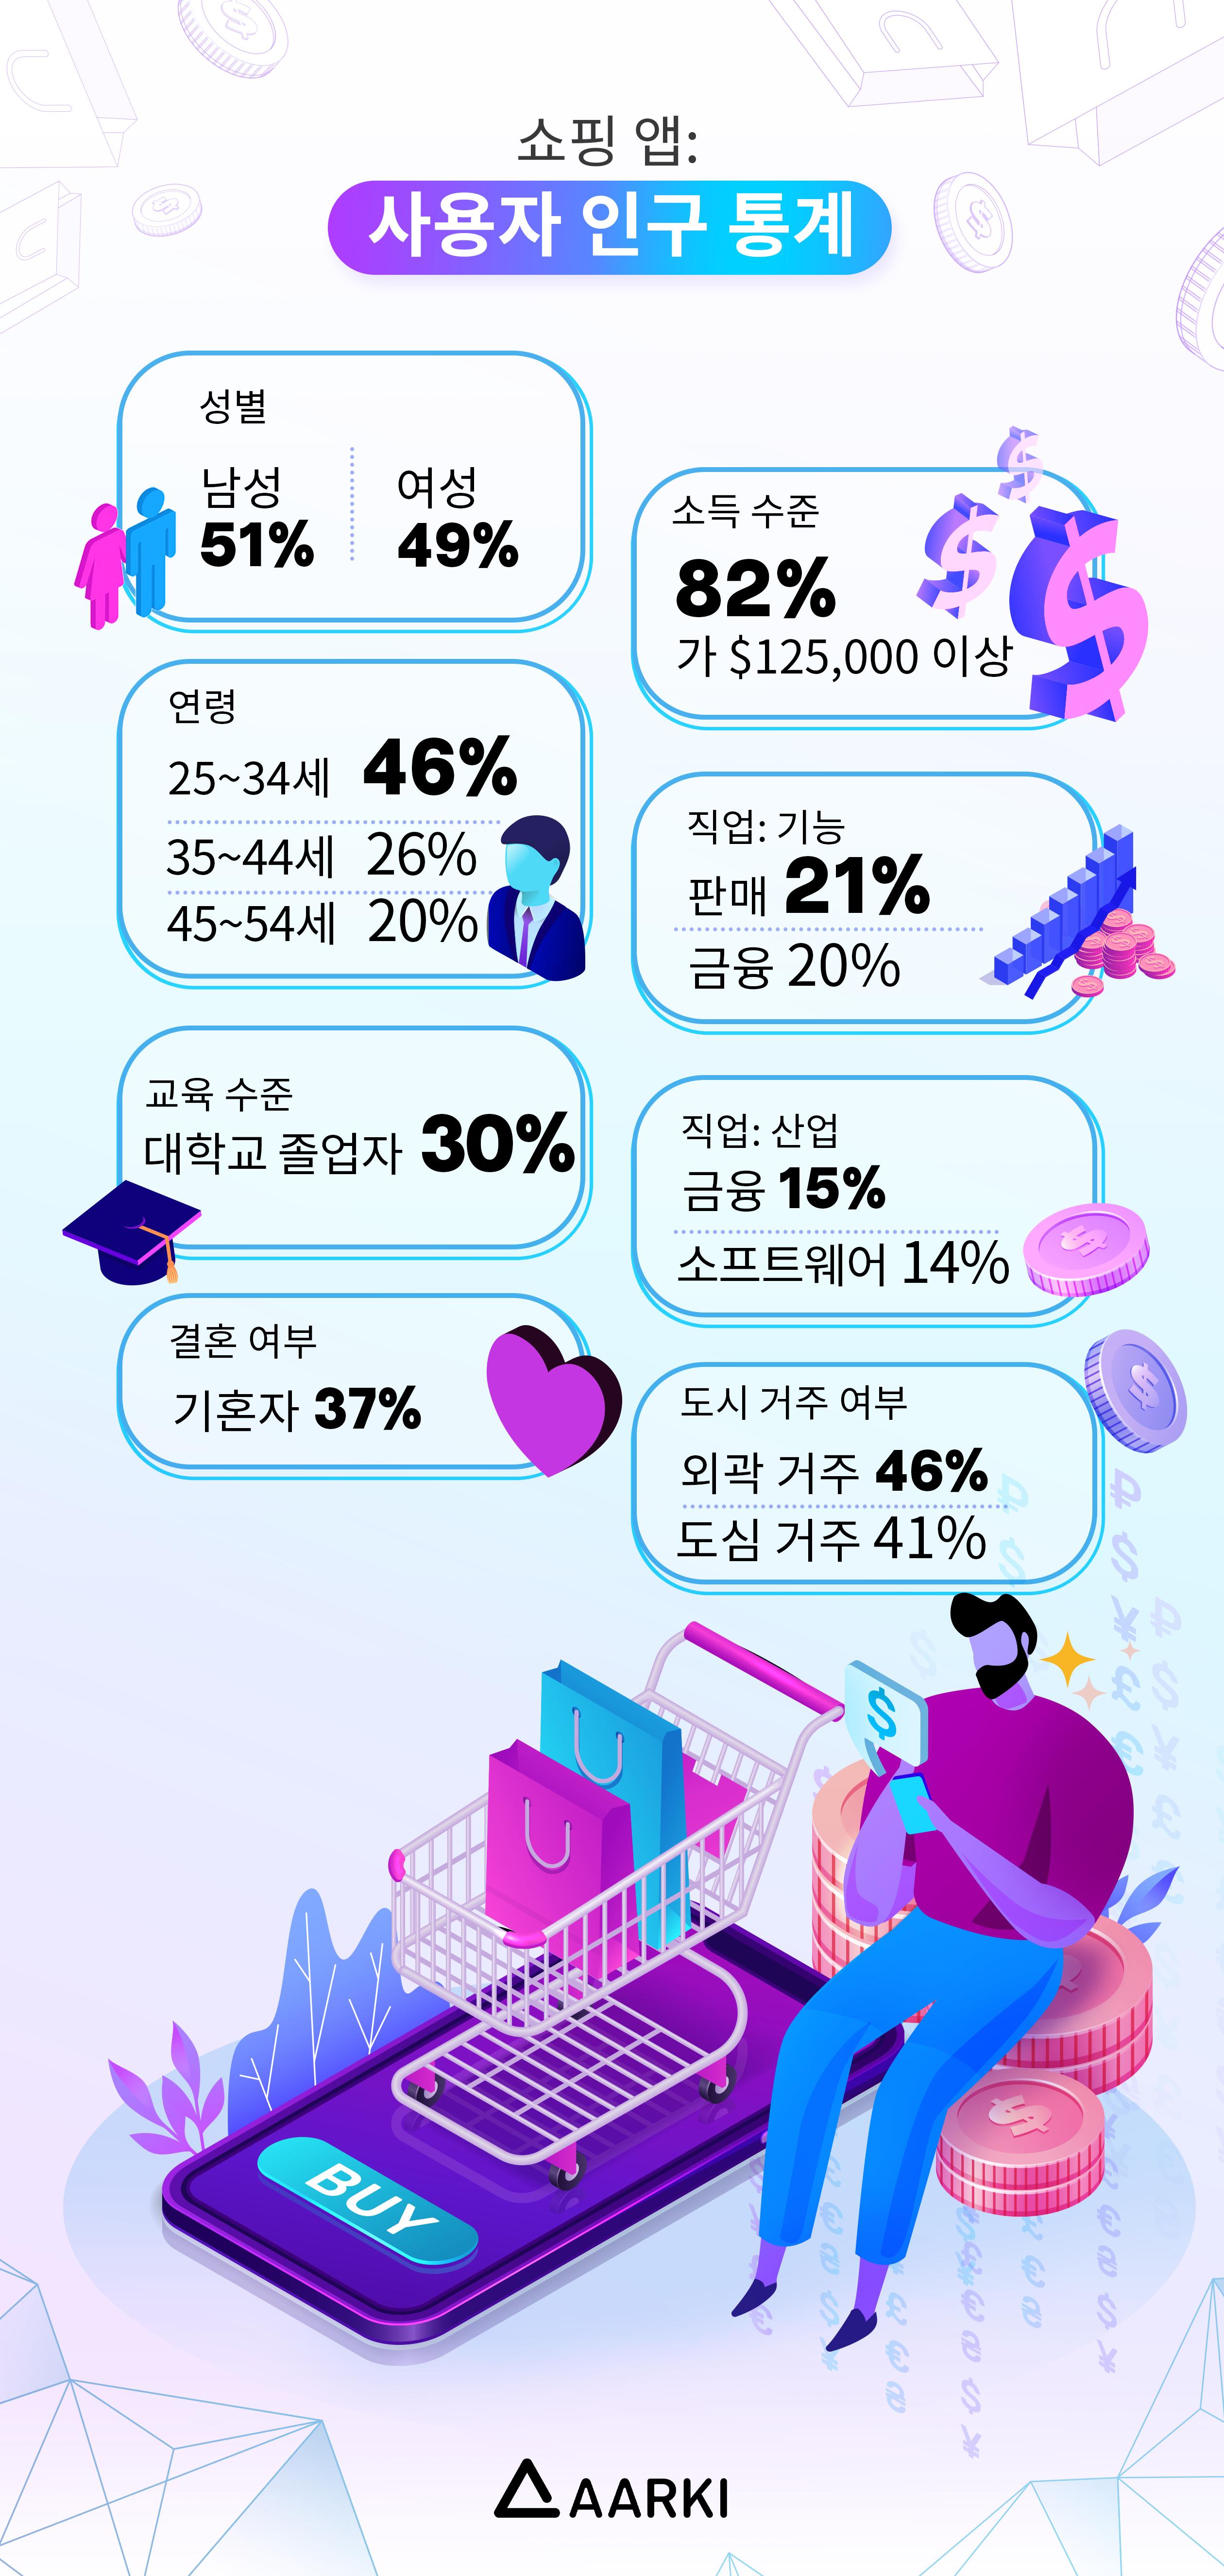 Marketplace-User-Demographic-KR-1